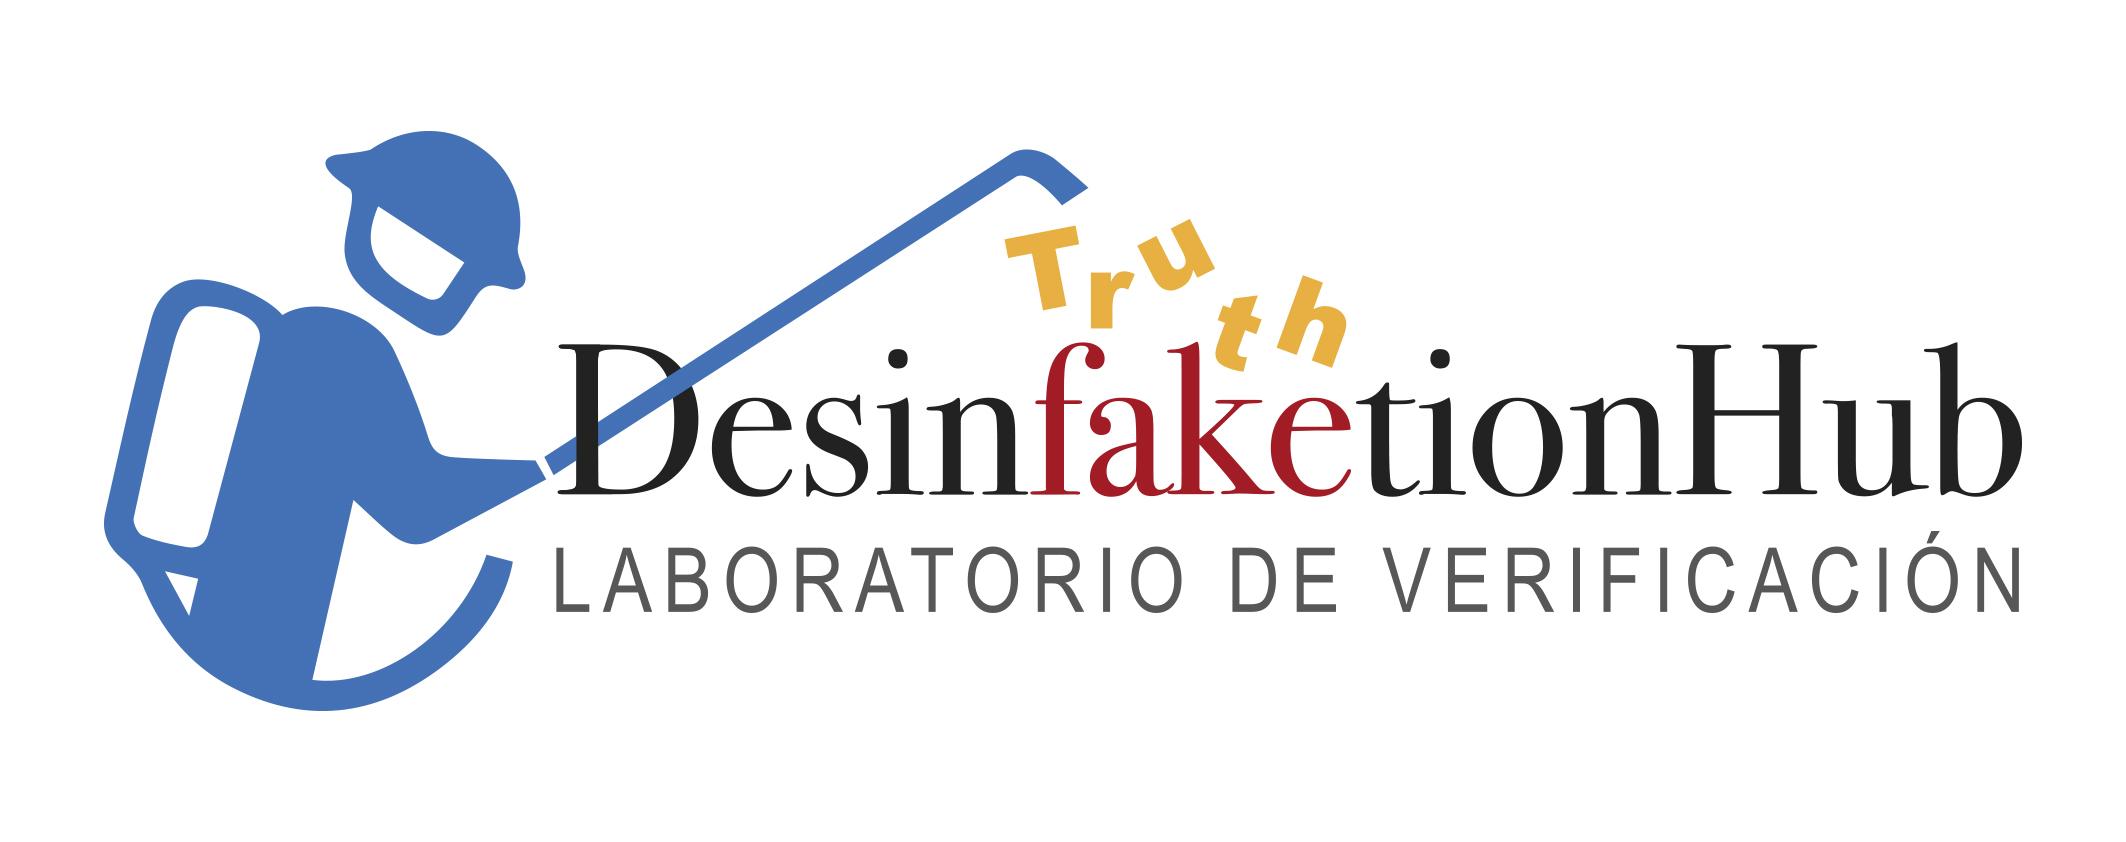 The Desinfaketion Hub